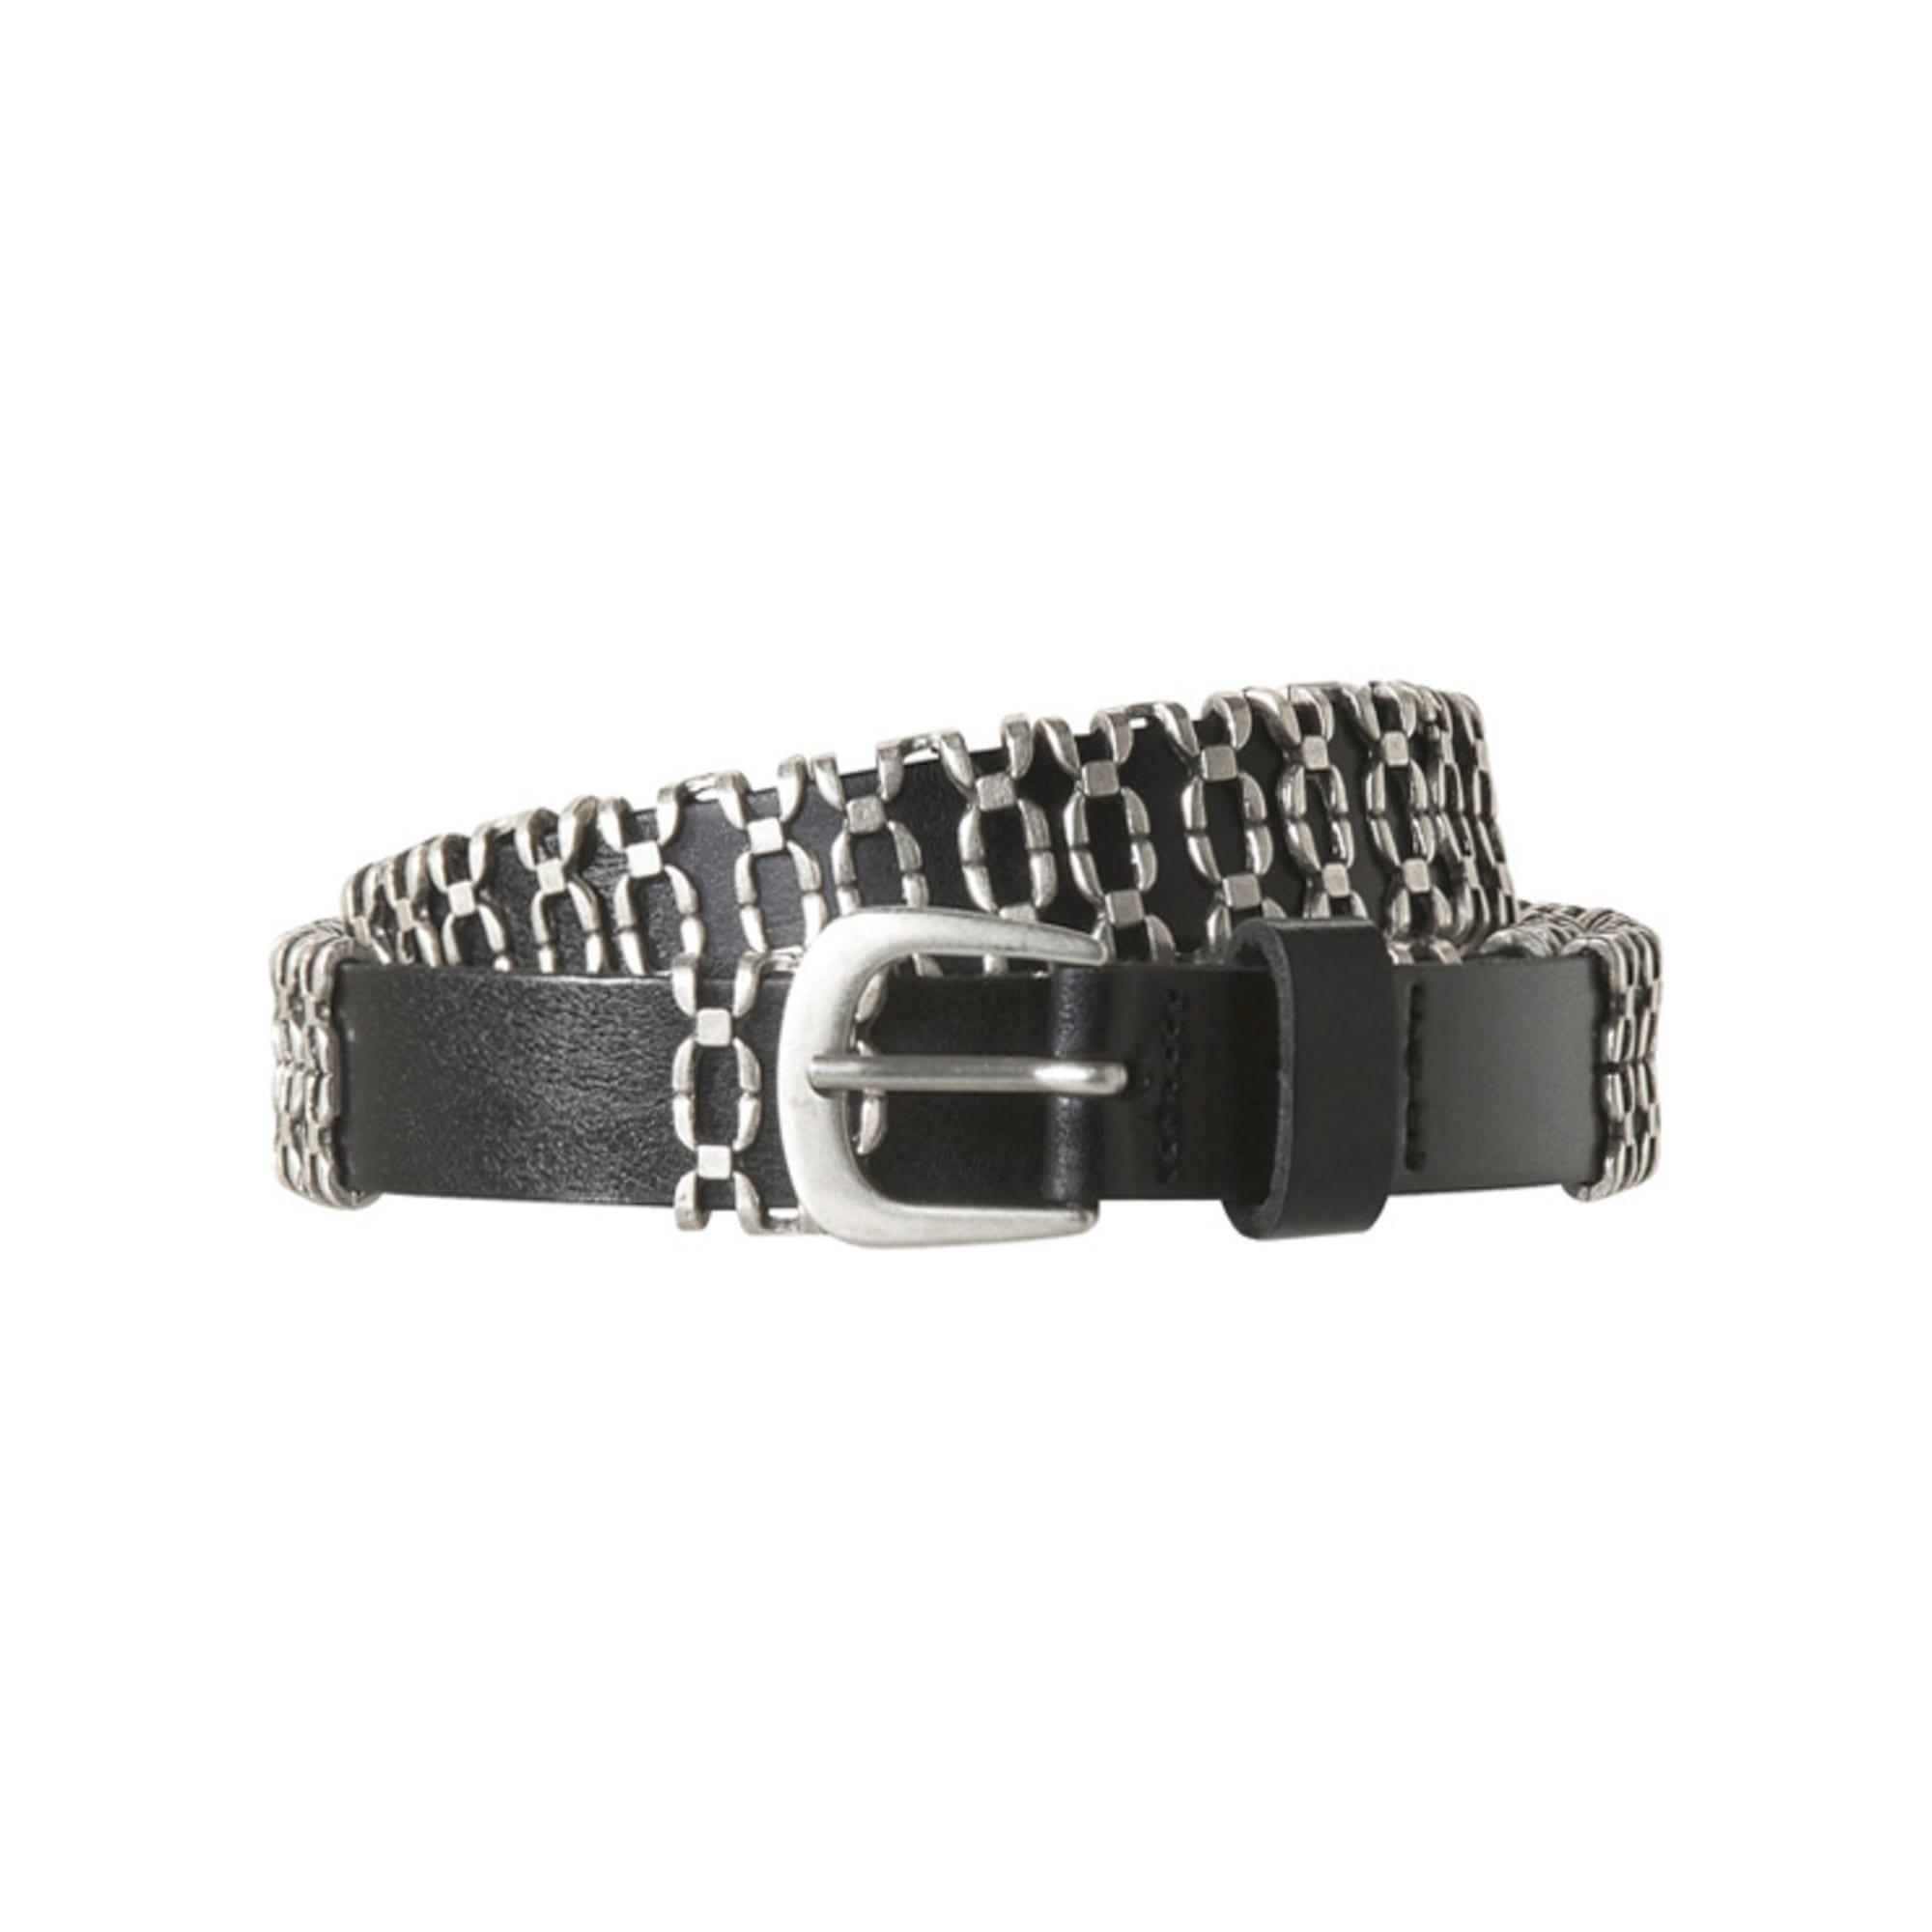 dfa4cb1b6275 Skinny Belt THE KOOPLES 90 black vendu par Luss pour antidot lyon ...